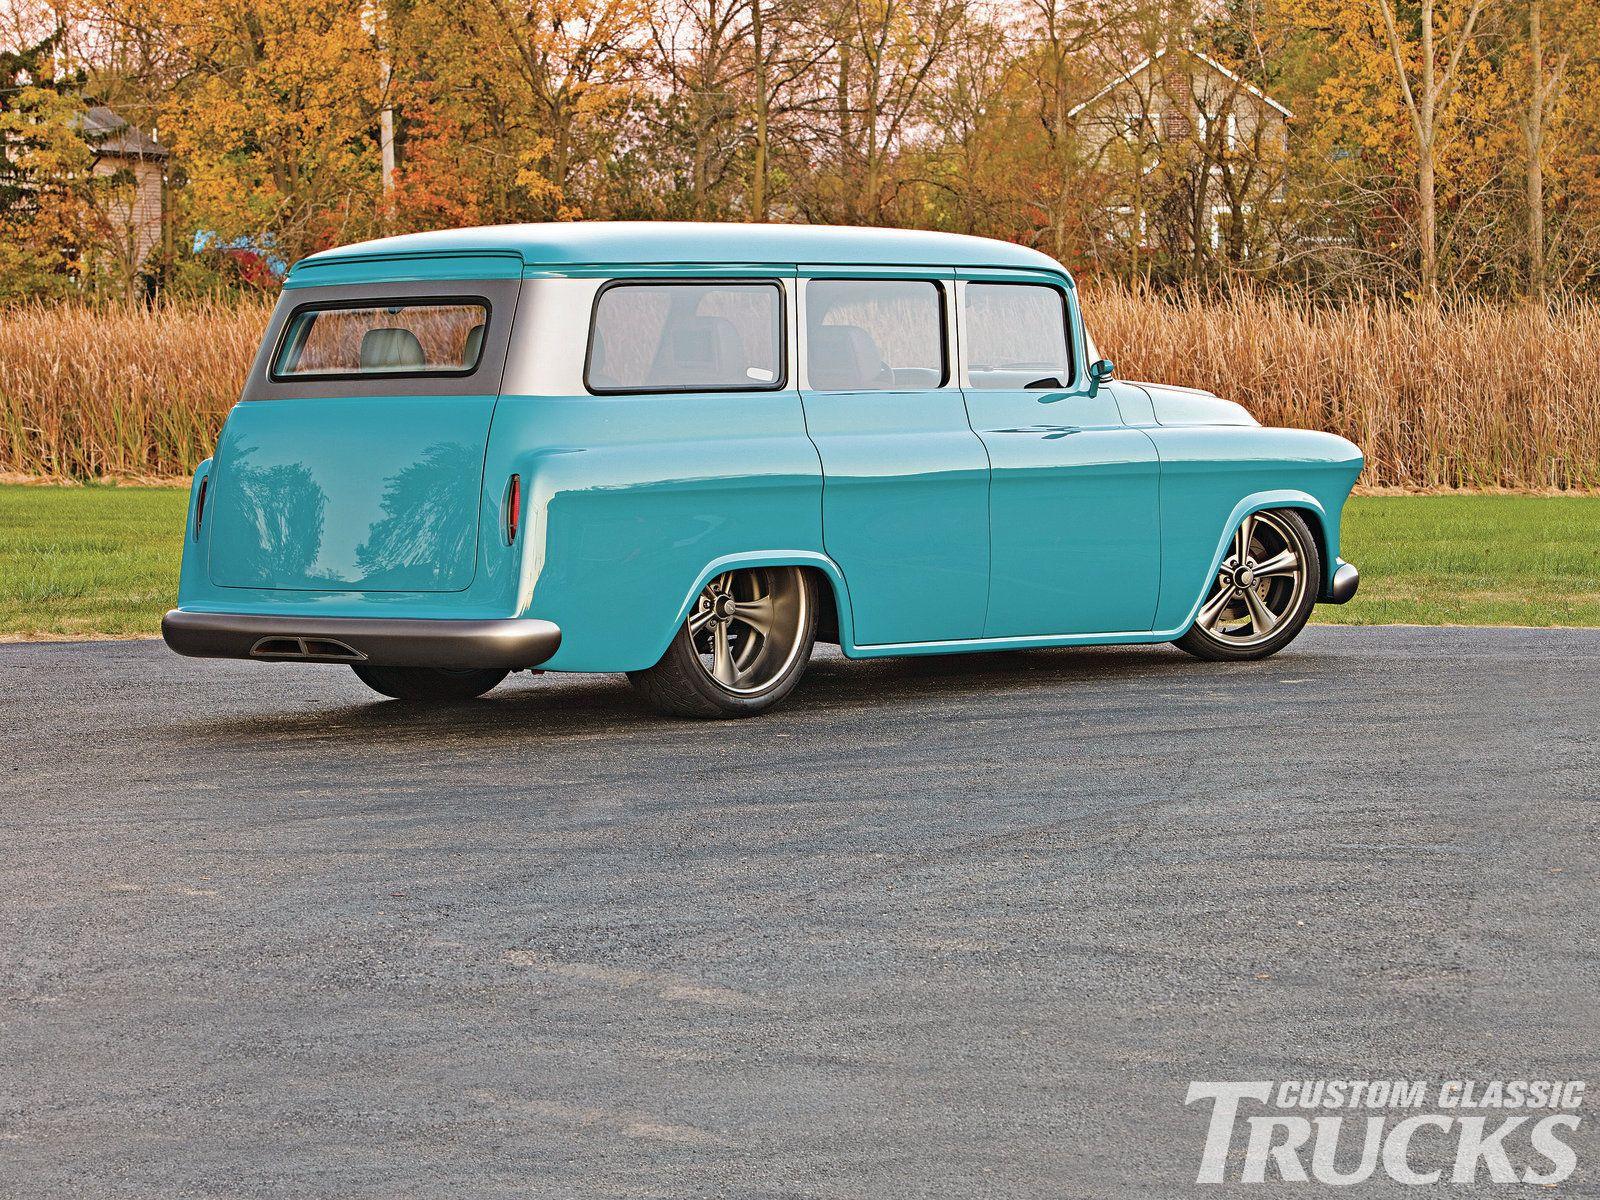 1957 Chevrolet Suburban Wheels Pinterest Chevy Trucks 1954 4x4 Lowrider Dodge Pickup